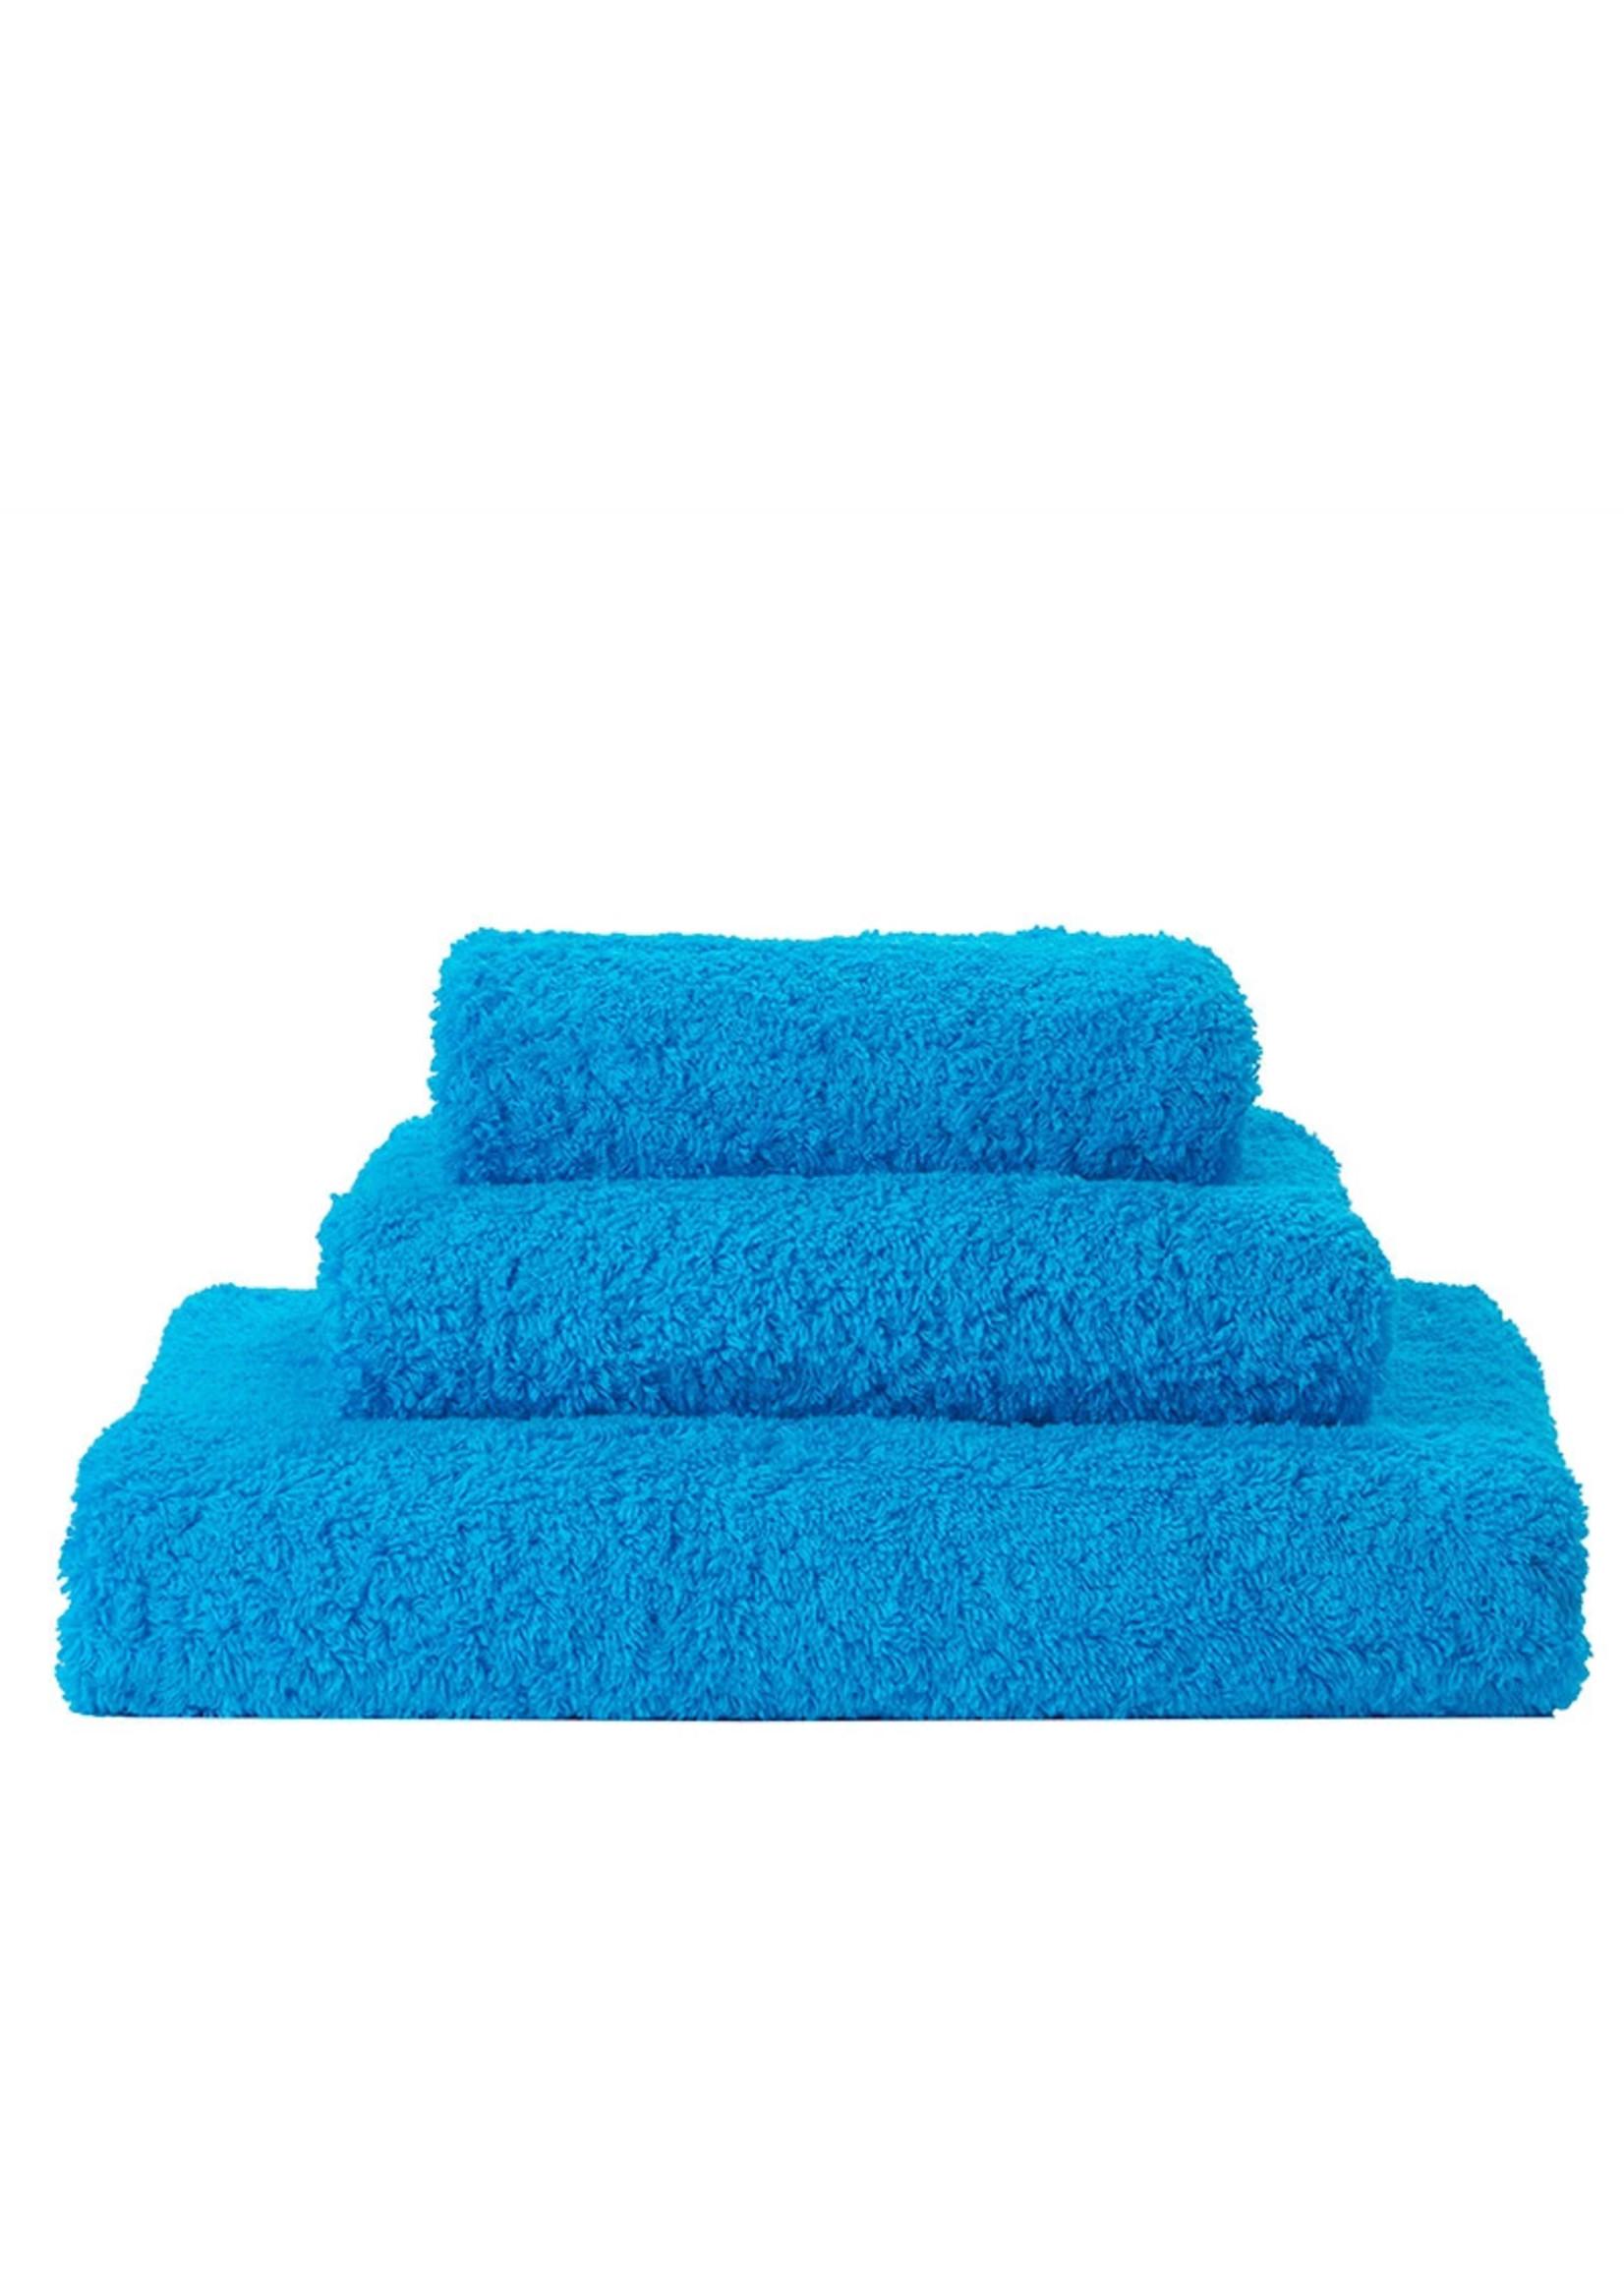 Abyss & Habidecor Super Pile Hawaii Towels